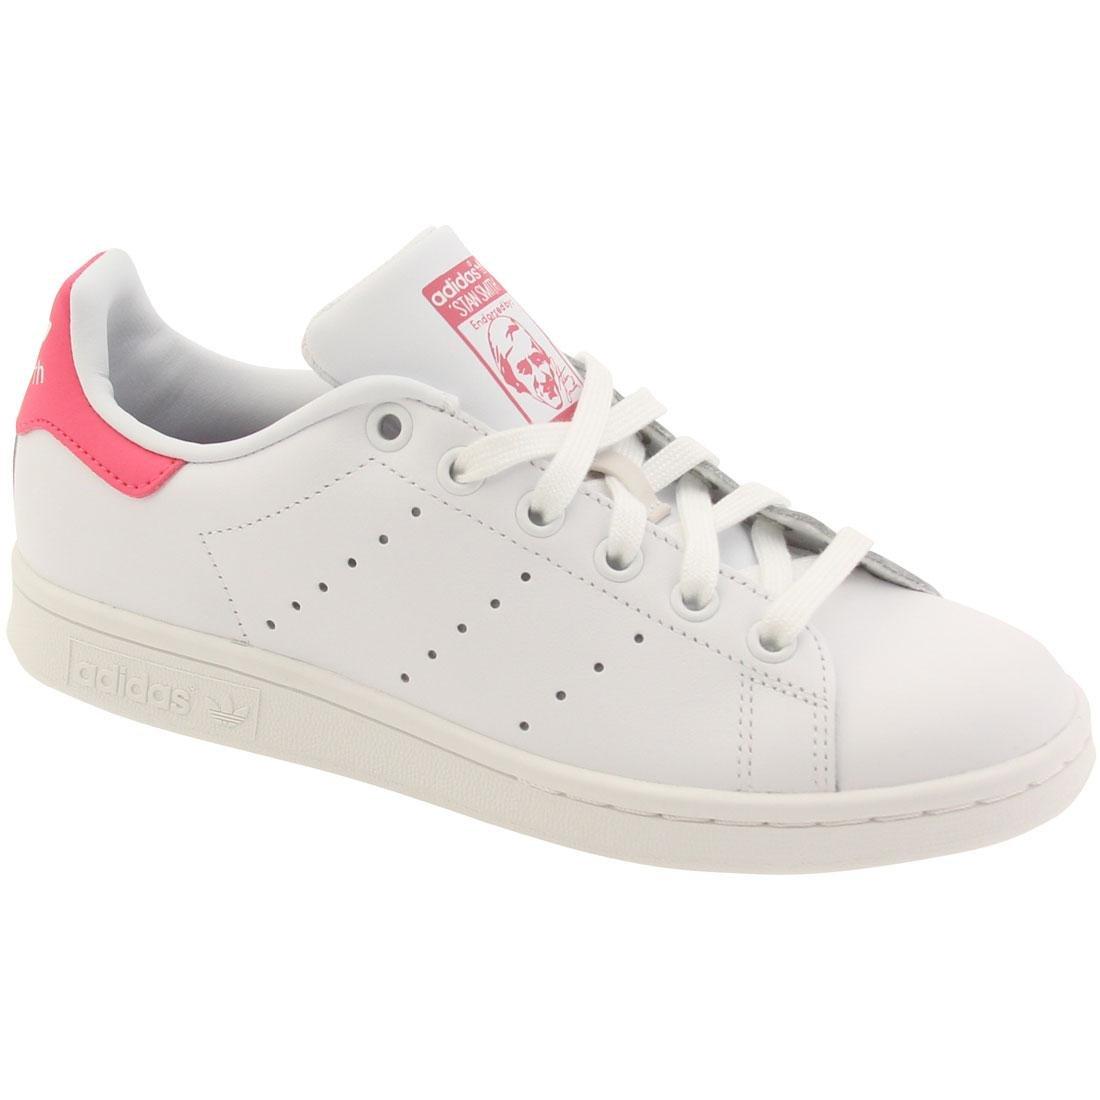 size 40 2e082 51c9b Amazon.com | Adidas Women Stan Smith Limited Edition White ...